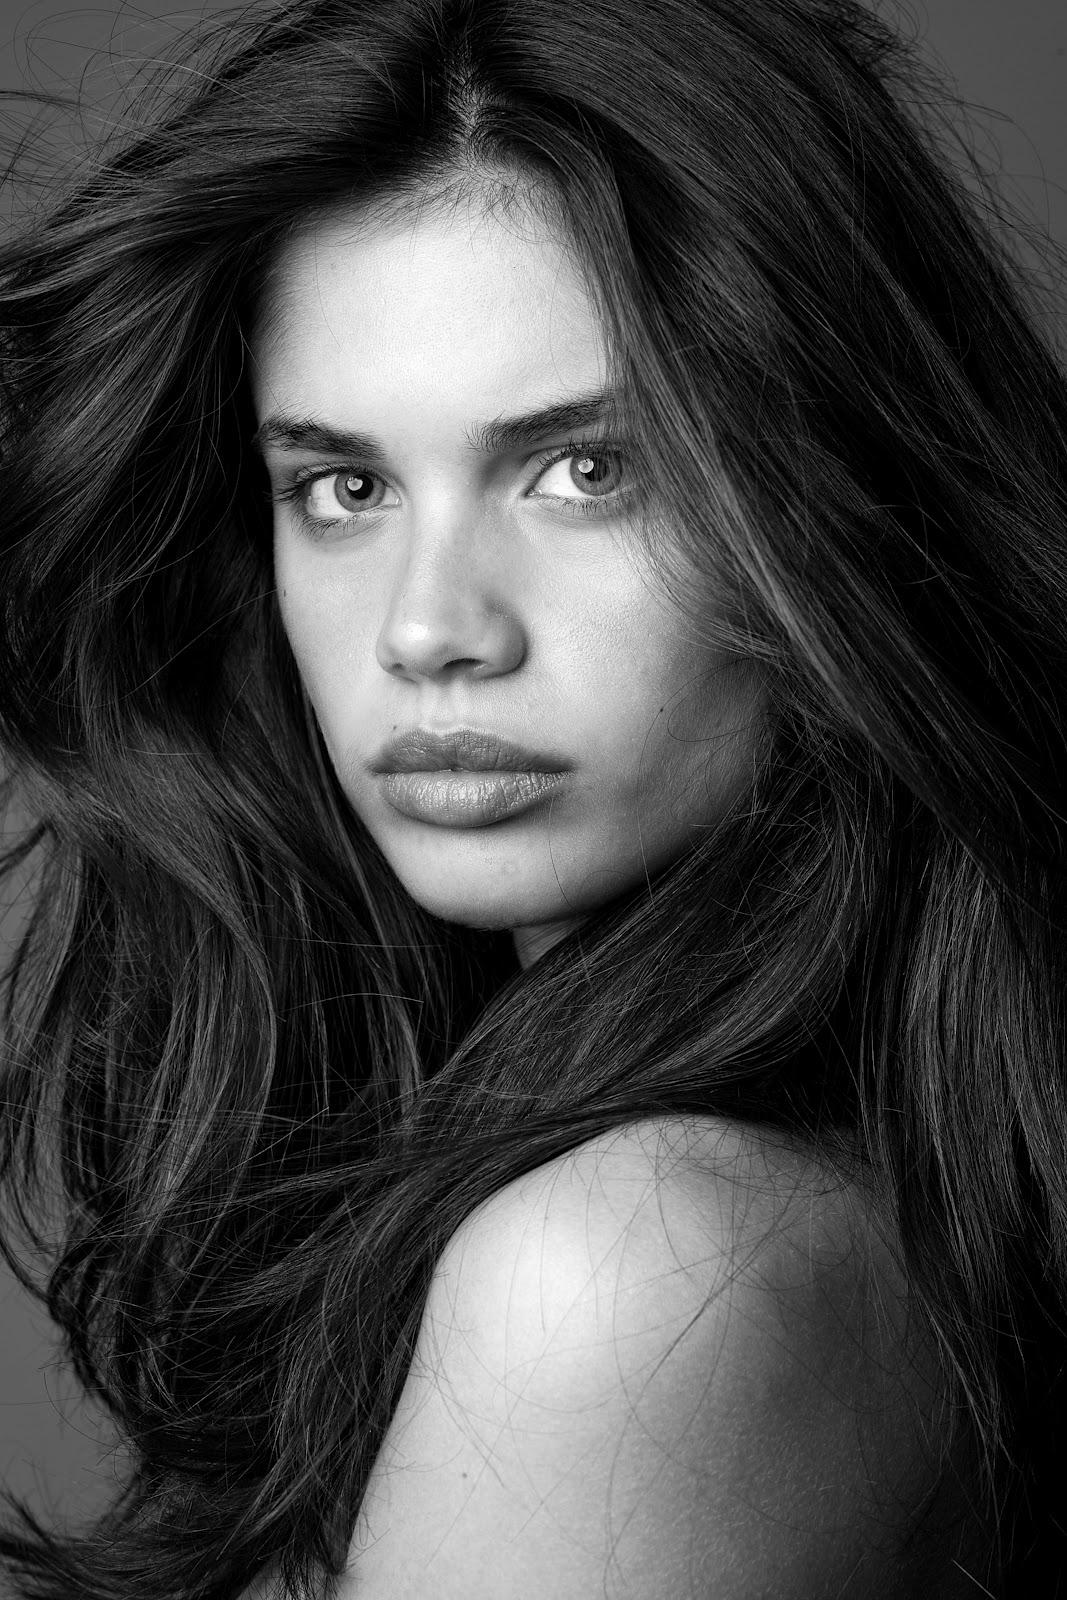 Sara Sampaio ♥ by Ken Pao 2011 (HQ portraits) - Models ...